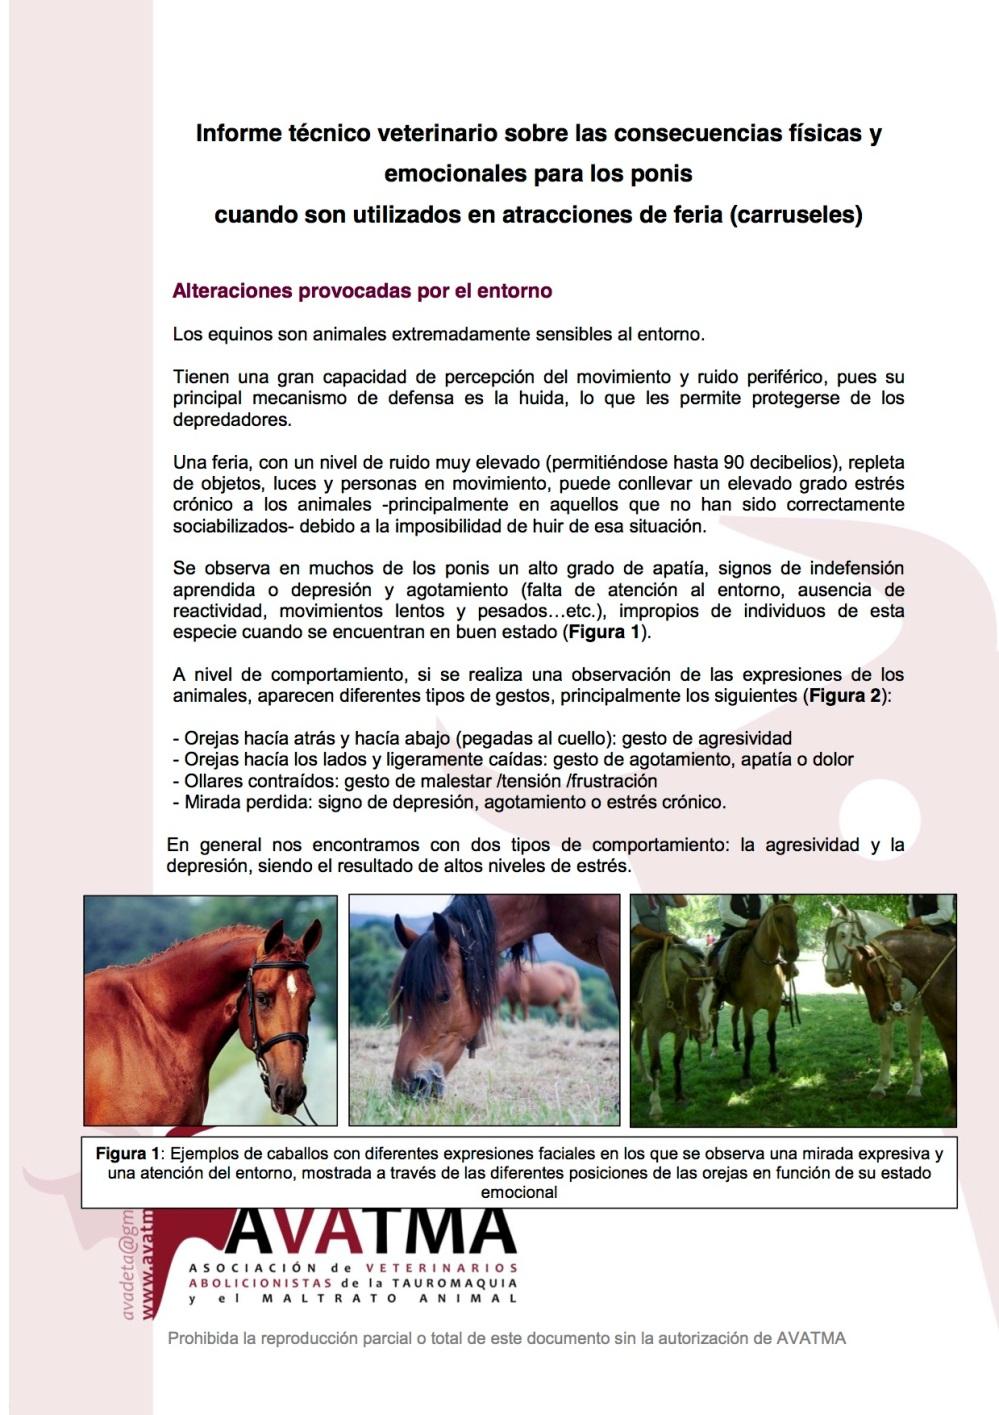 Informe carruseles ponis1